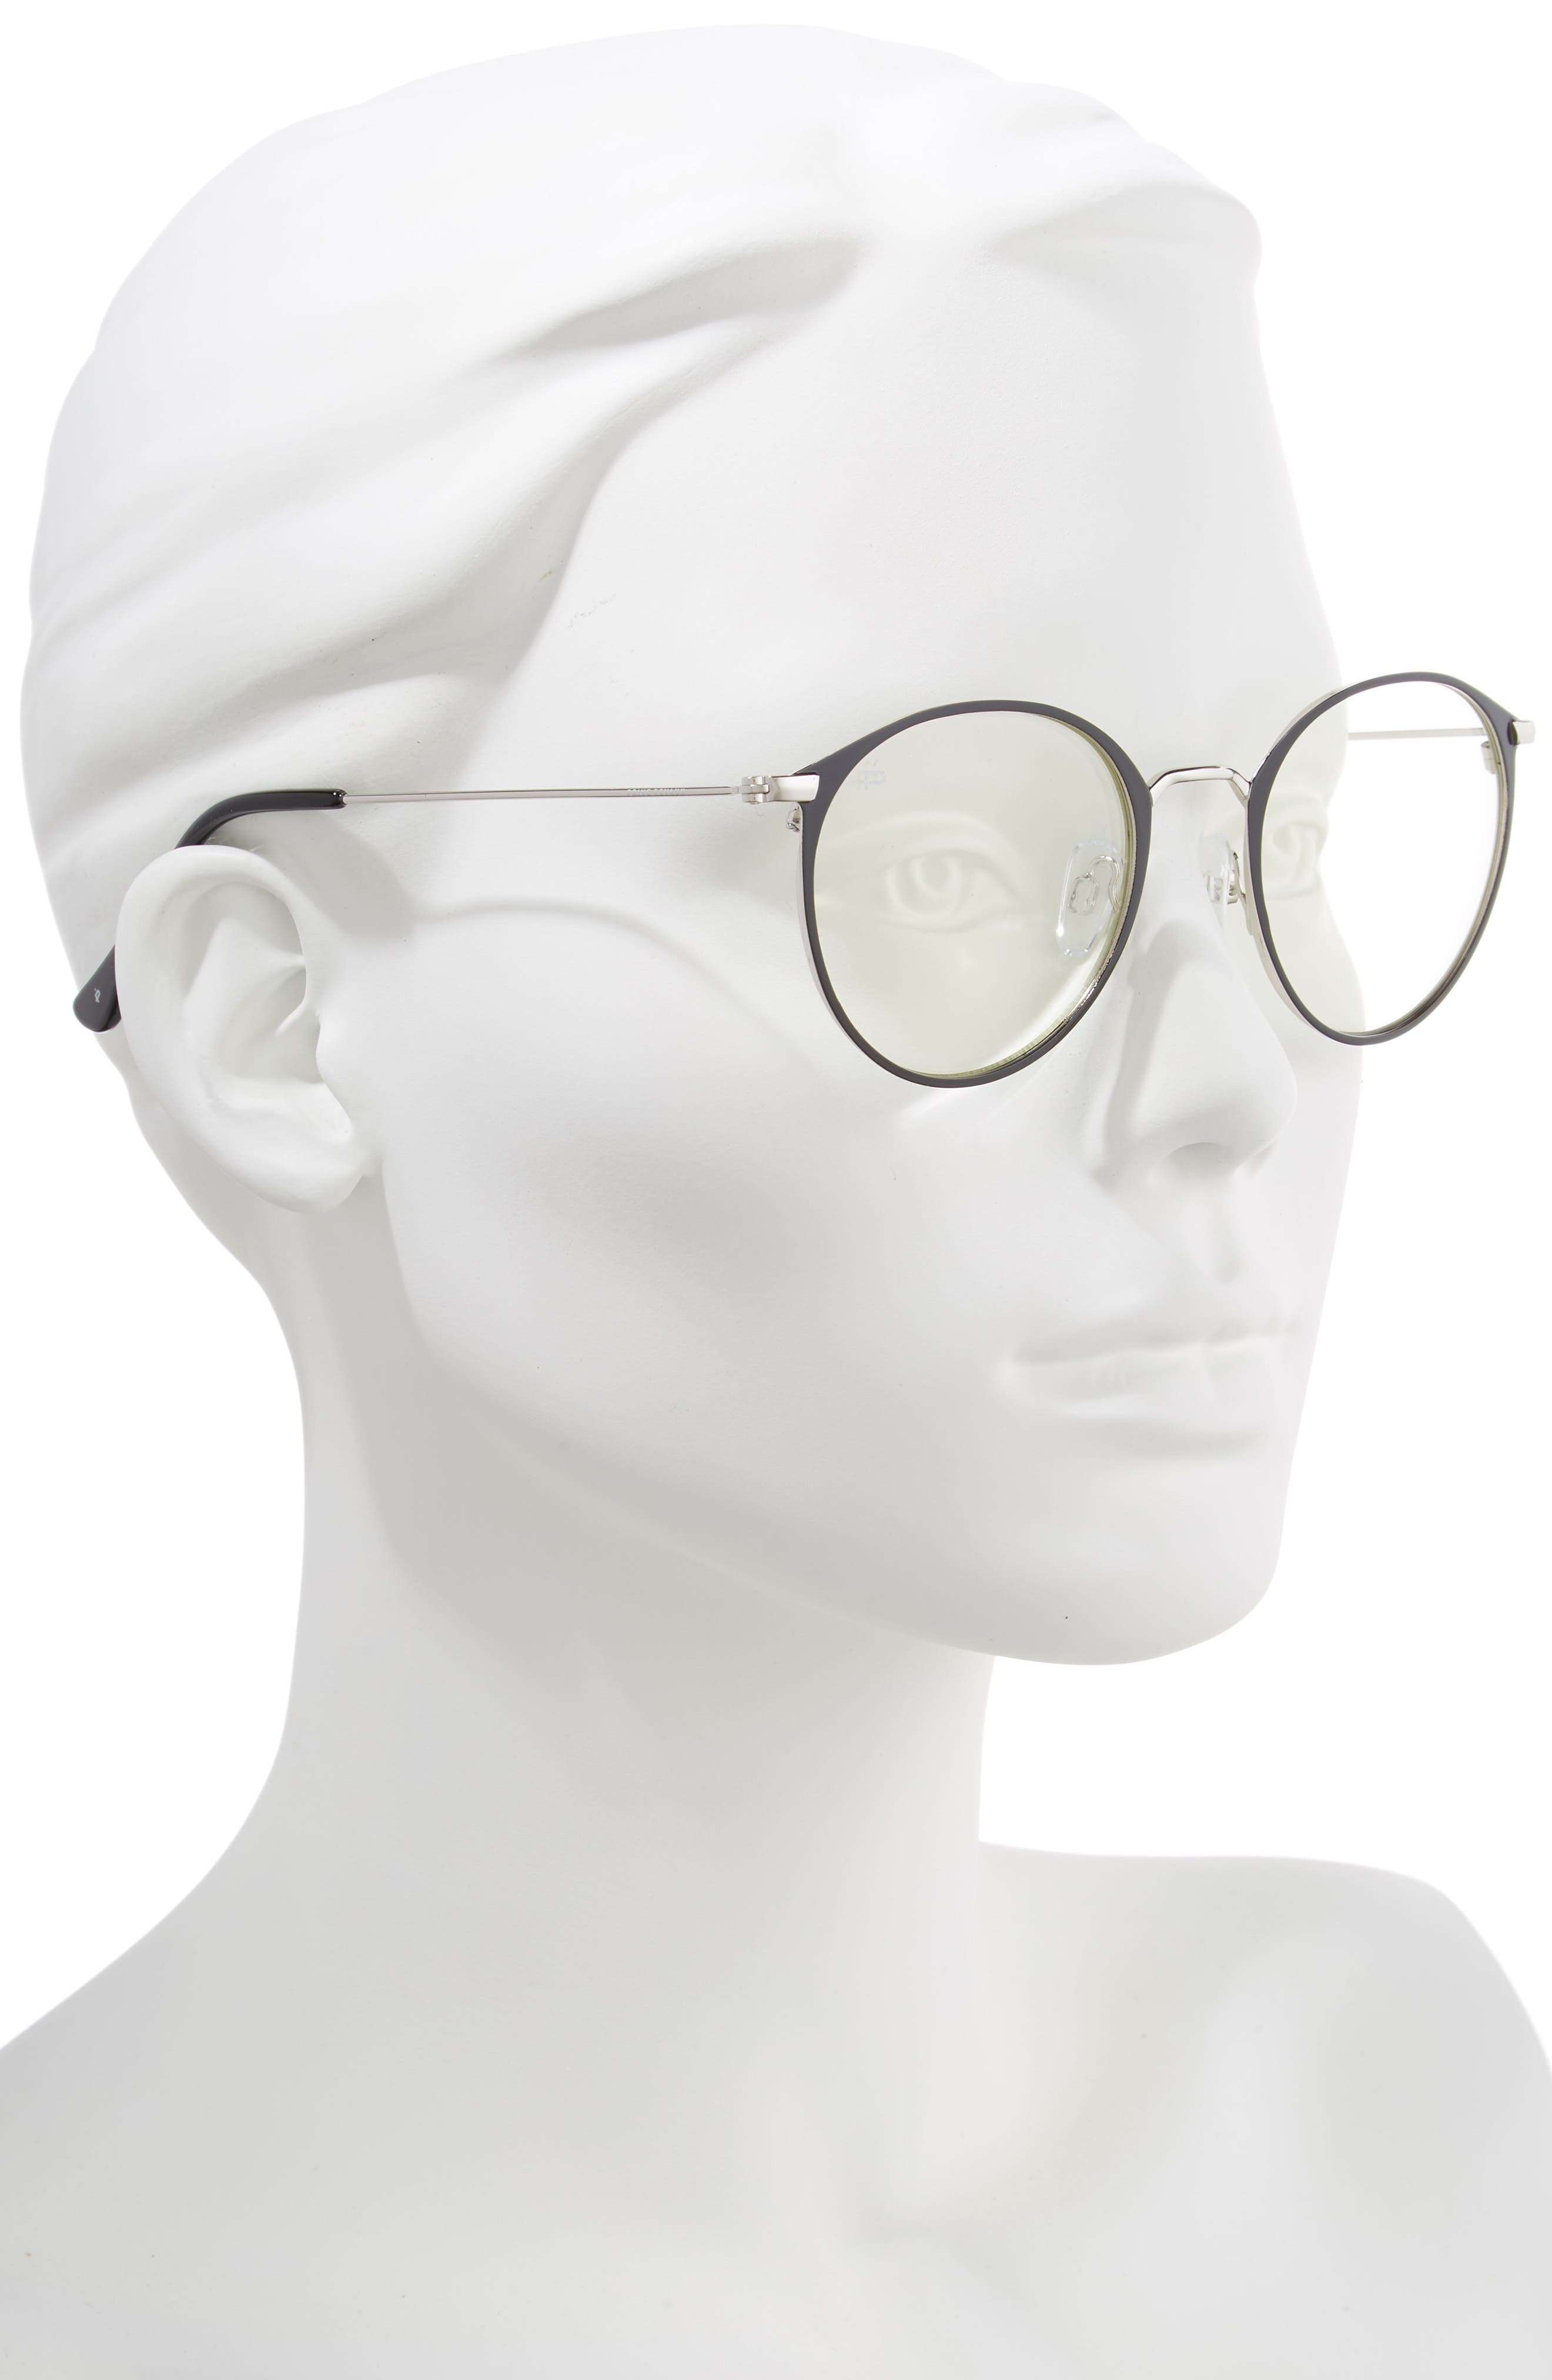 The Rand 51mm Blue Light Blocking Glasses,                             Alternate thumbnail 2, color,                             002